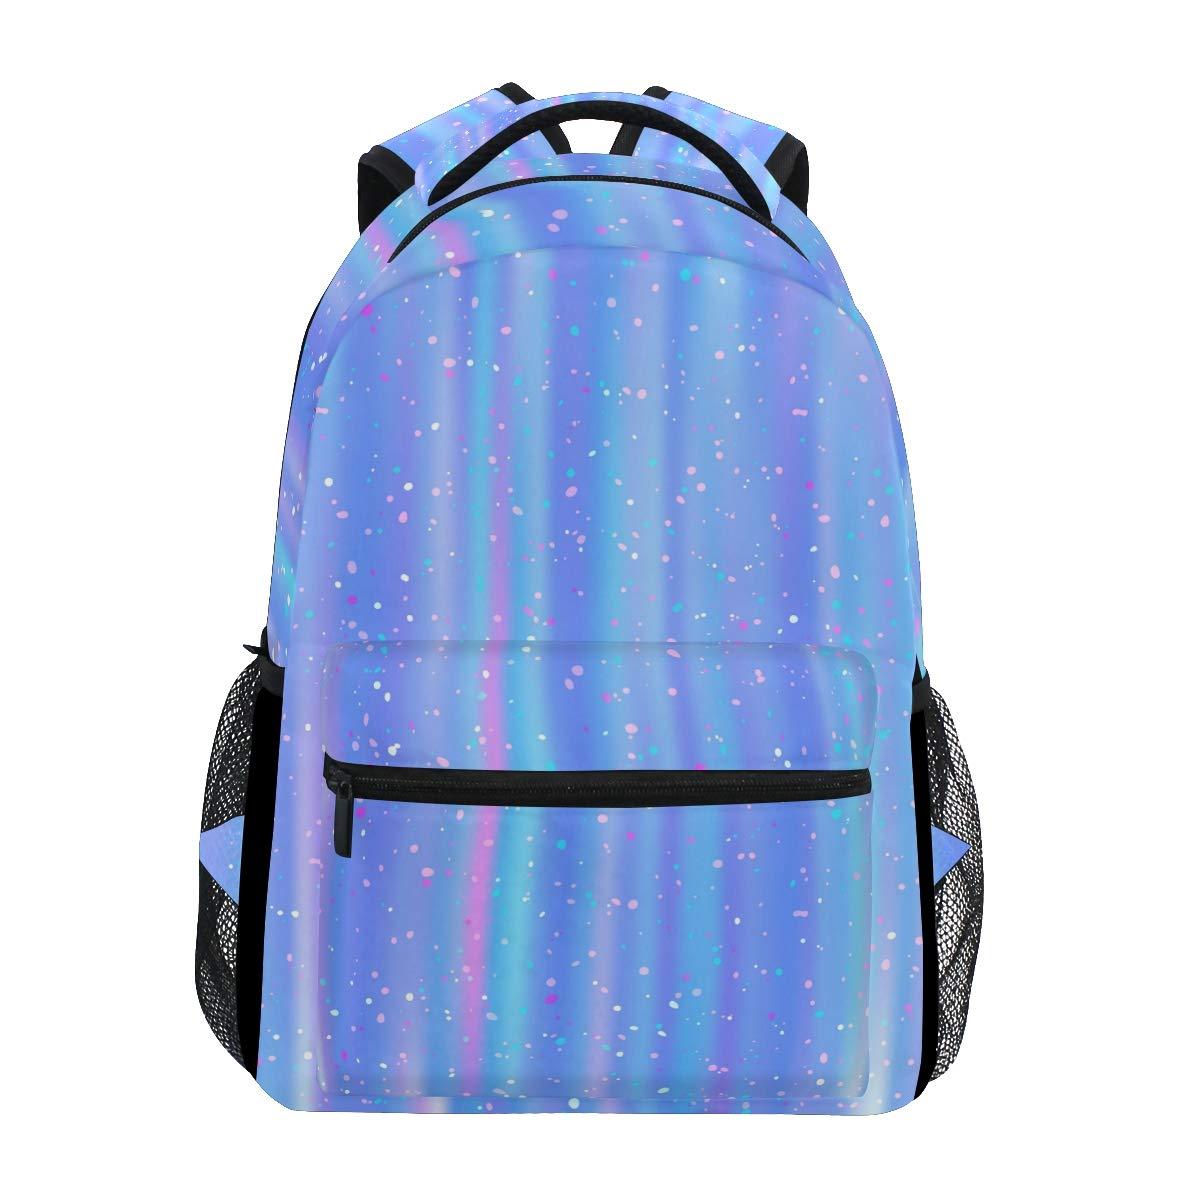 DOSHINE g15948438p203c237s337, Unisex-Erwachsene Kinderrucksack Mehrfarbig Mehrfarbig 11.5''x8''x16''